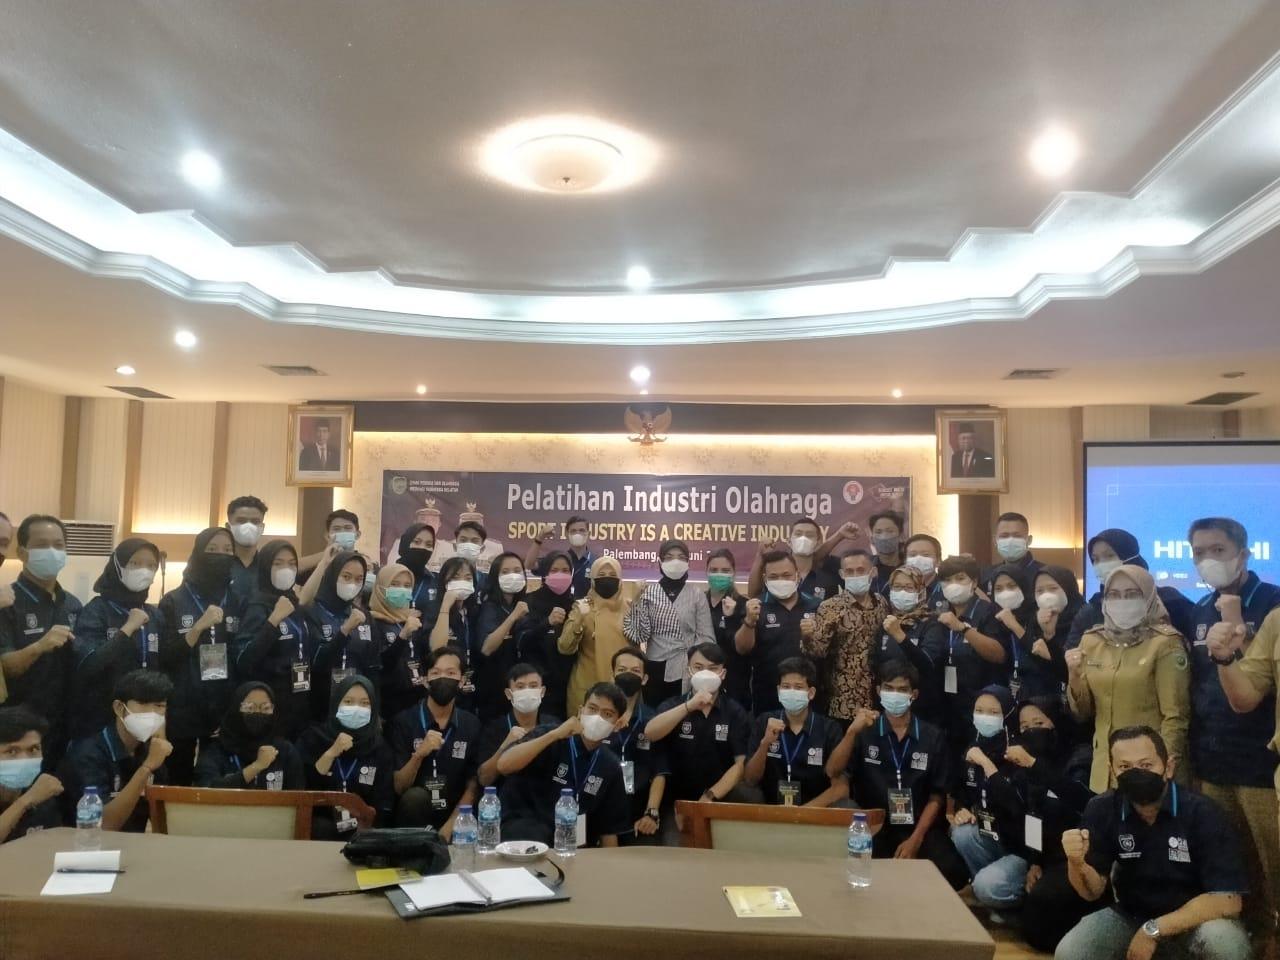 Asisten Deputi Industri Promosi Olahraga Kementrian Pemuda dan Olahraga (Kemenpora) Republik Indonesia (RI), Sri Wahyuni menghadiri pelatihan industri olahraga di Hotel Swarna Dwipa Palembang (Reza Fajri / Mattanews.co)